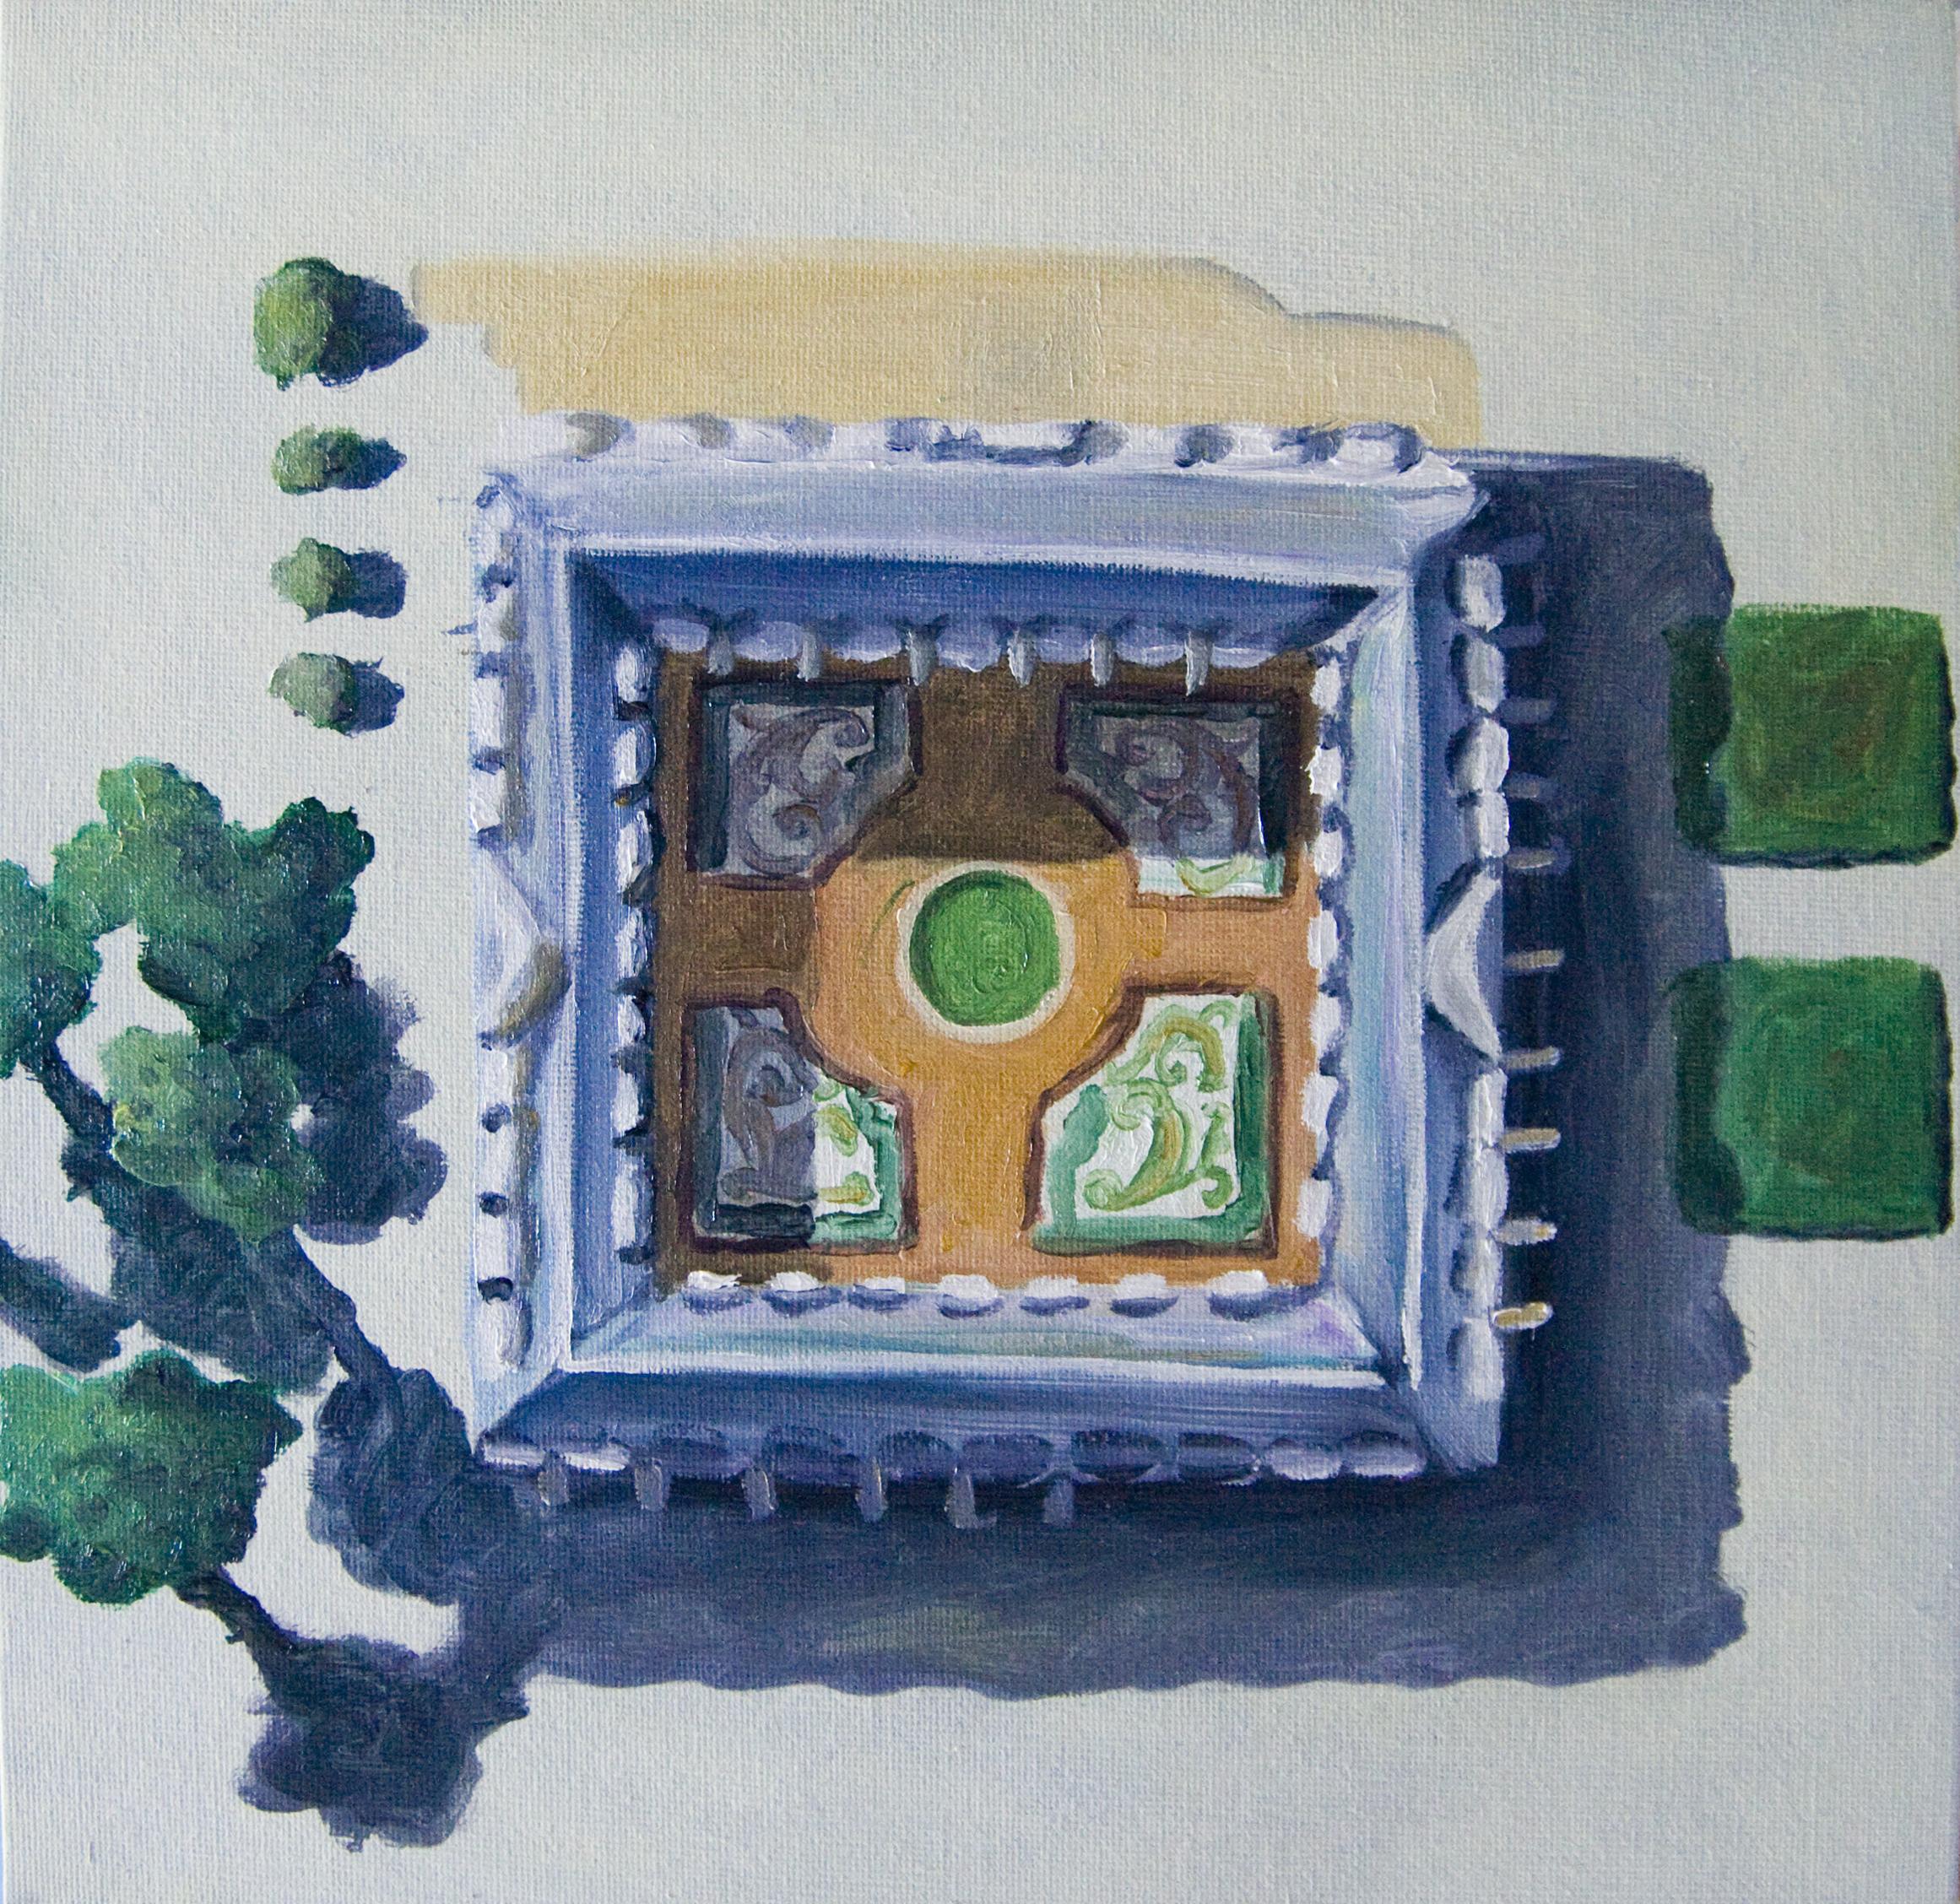 Val-de-Grâce   12x12, oil on canvas board  2011